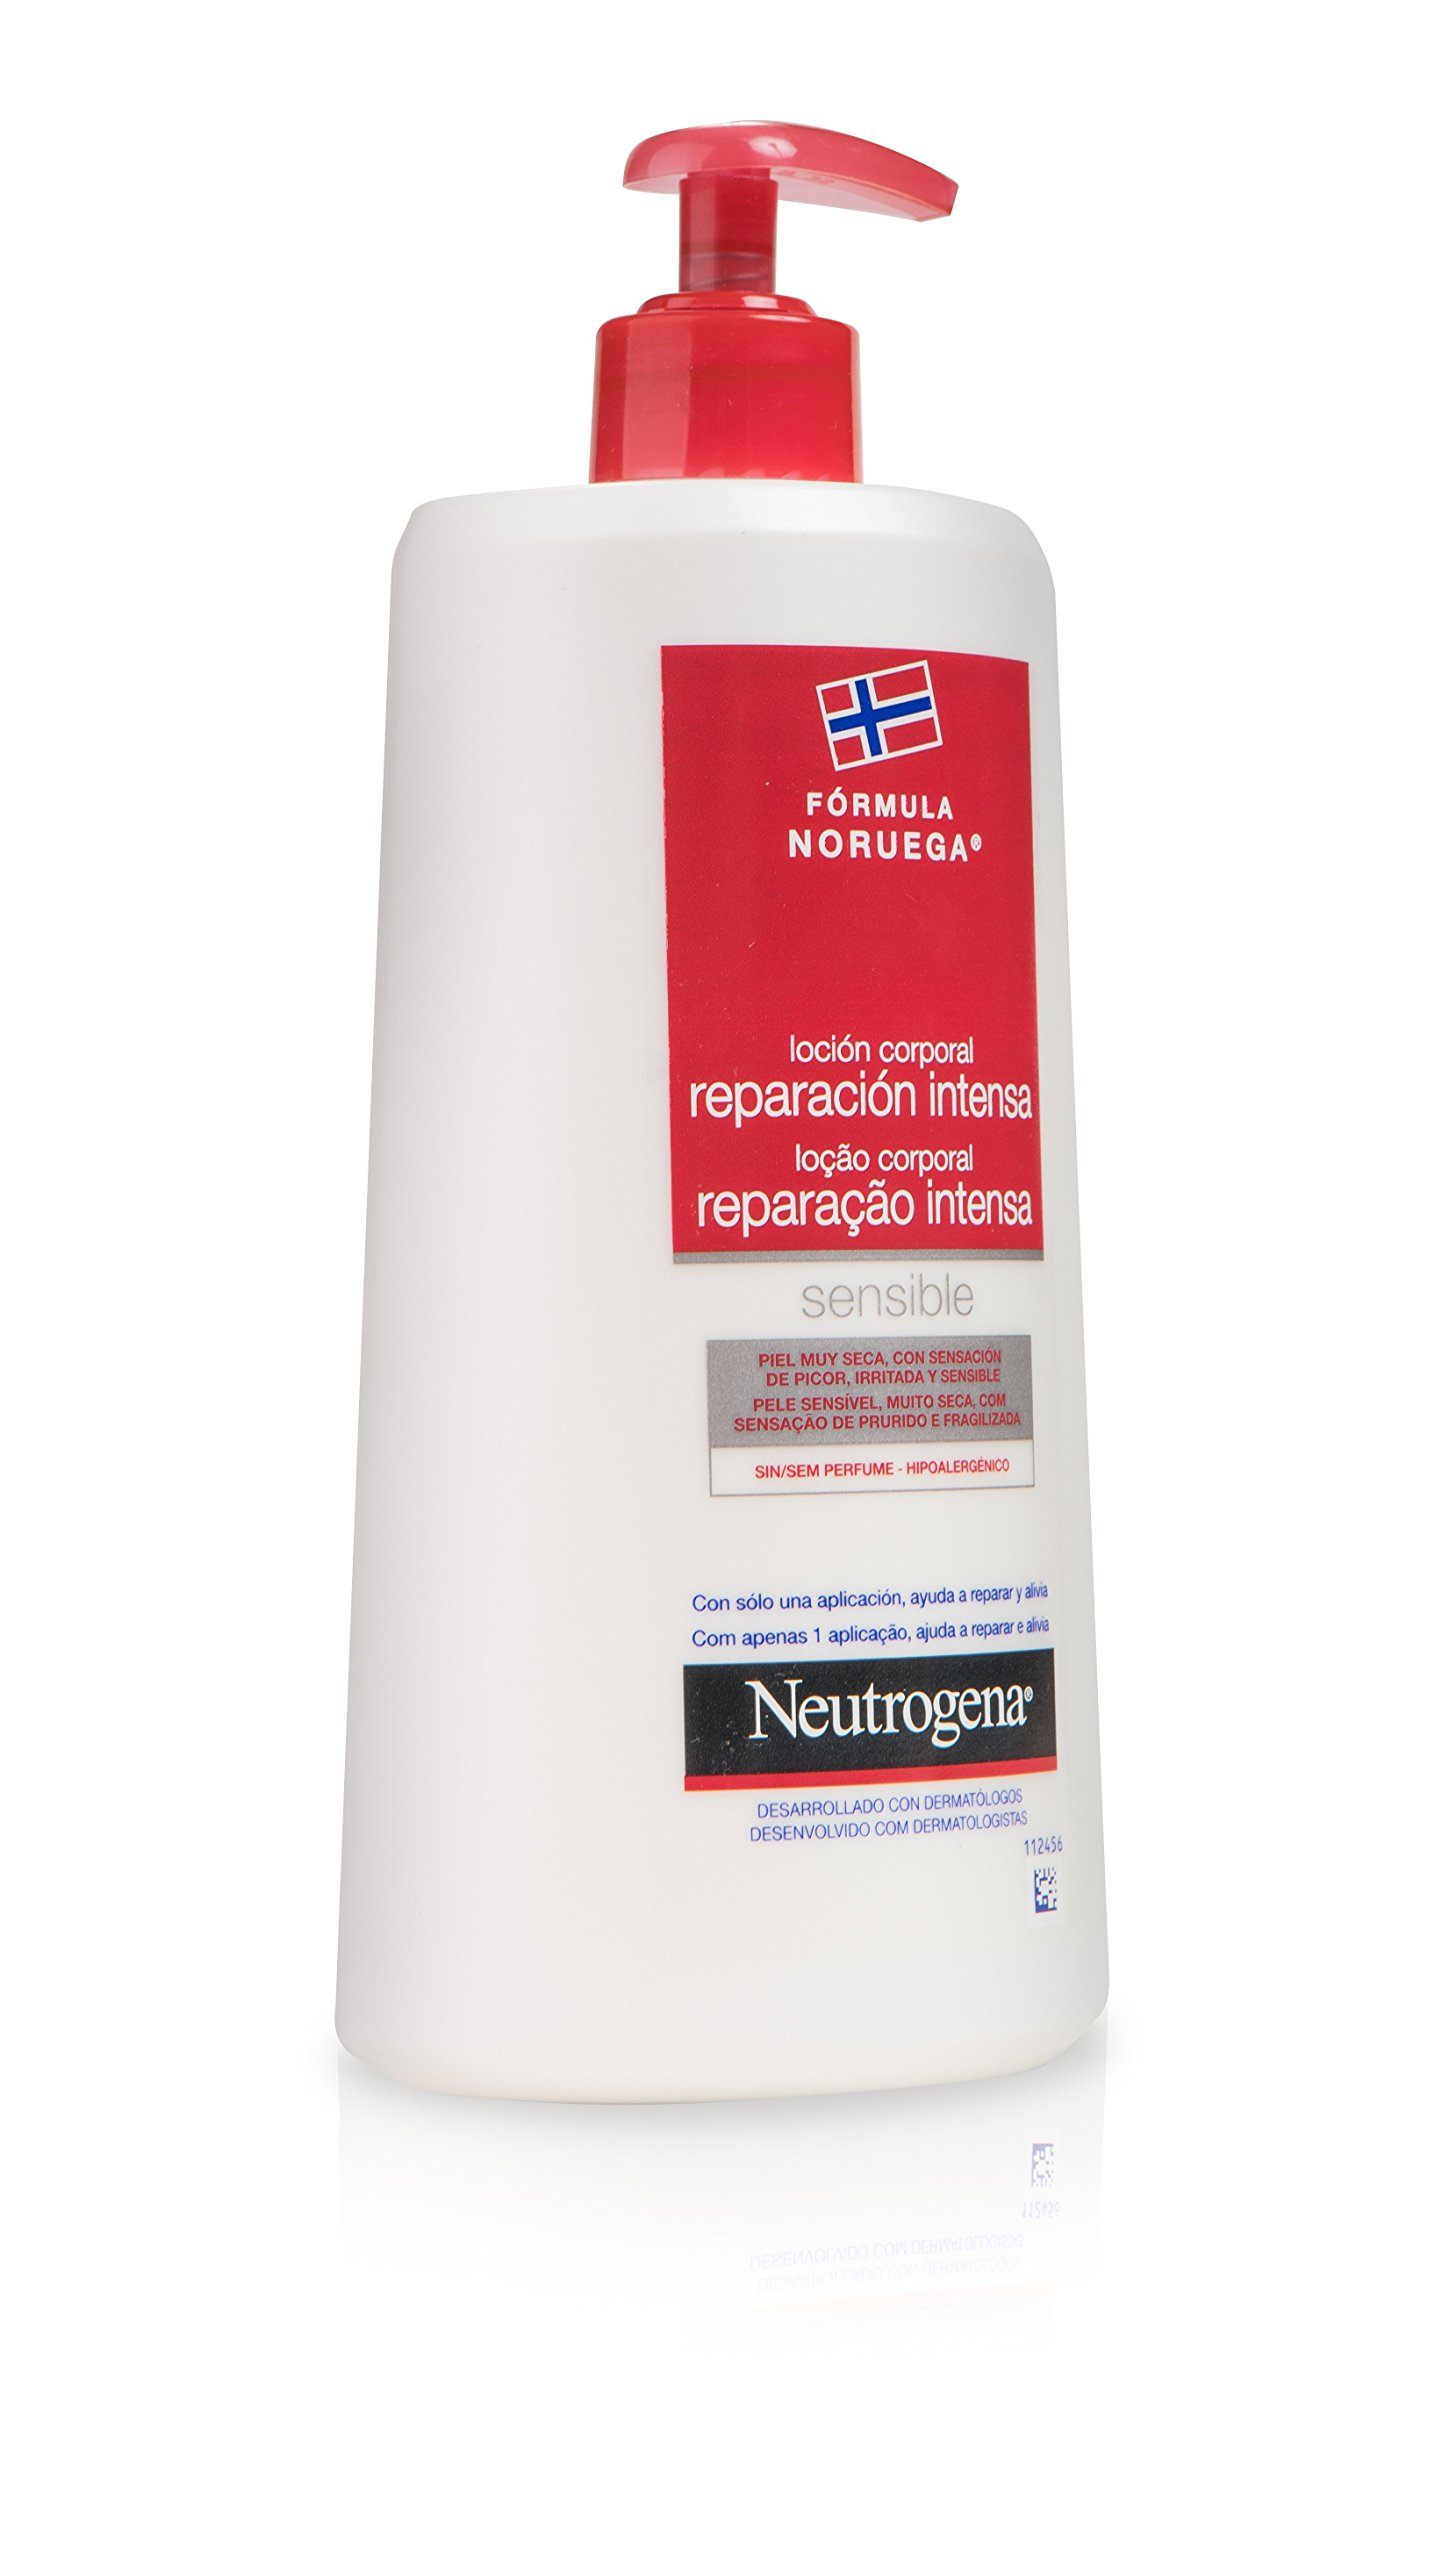 Neutrogena Sensible Loción Corporal Reparación Intensa – 750 ml.